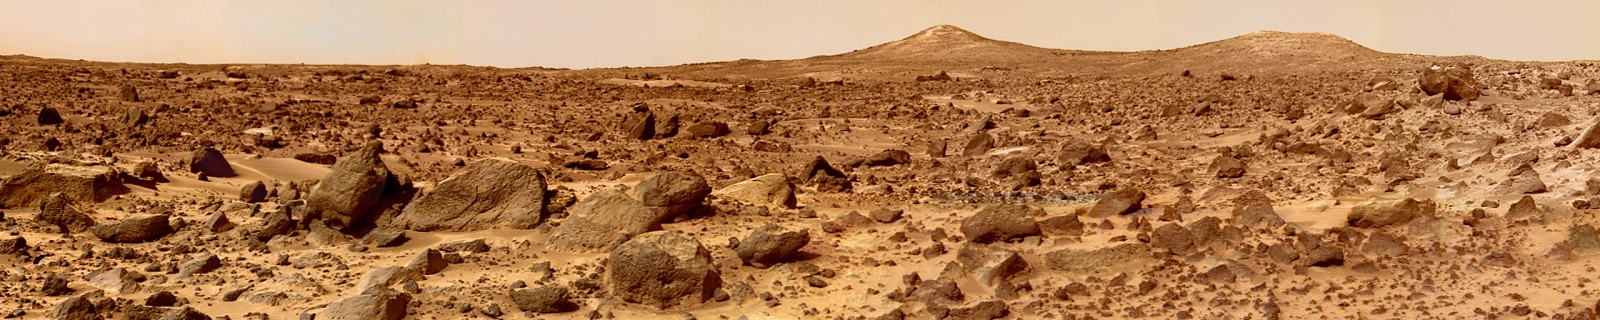 Geology Photo